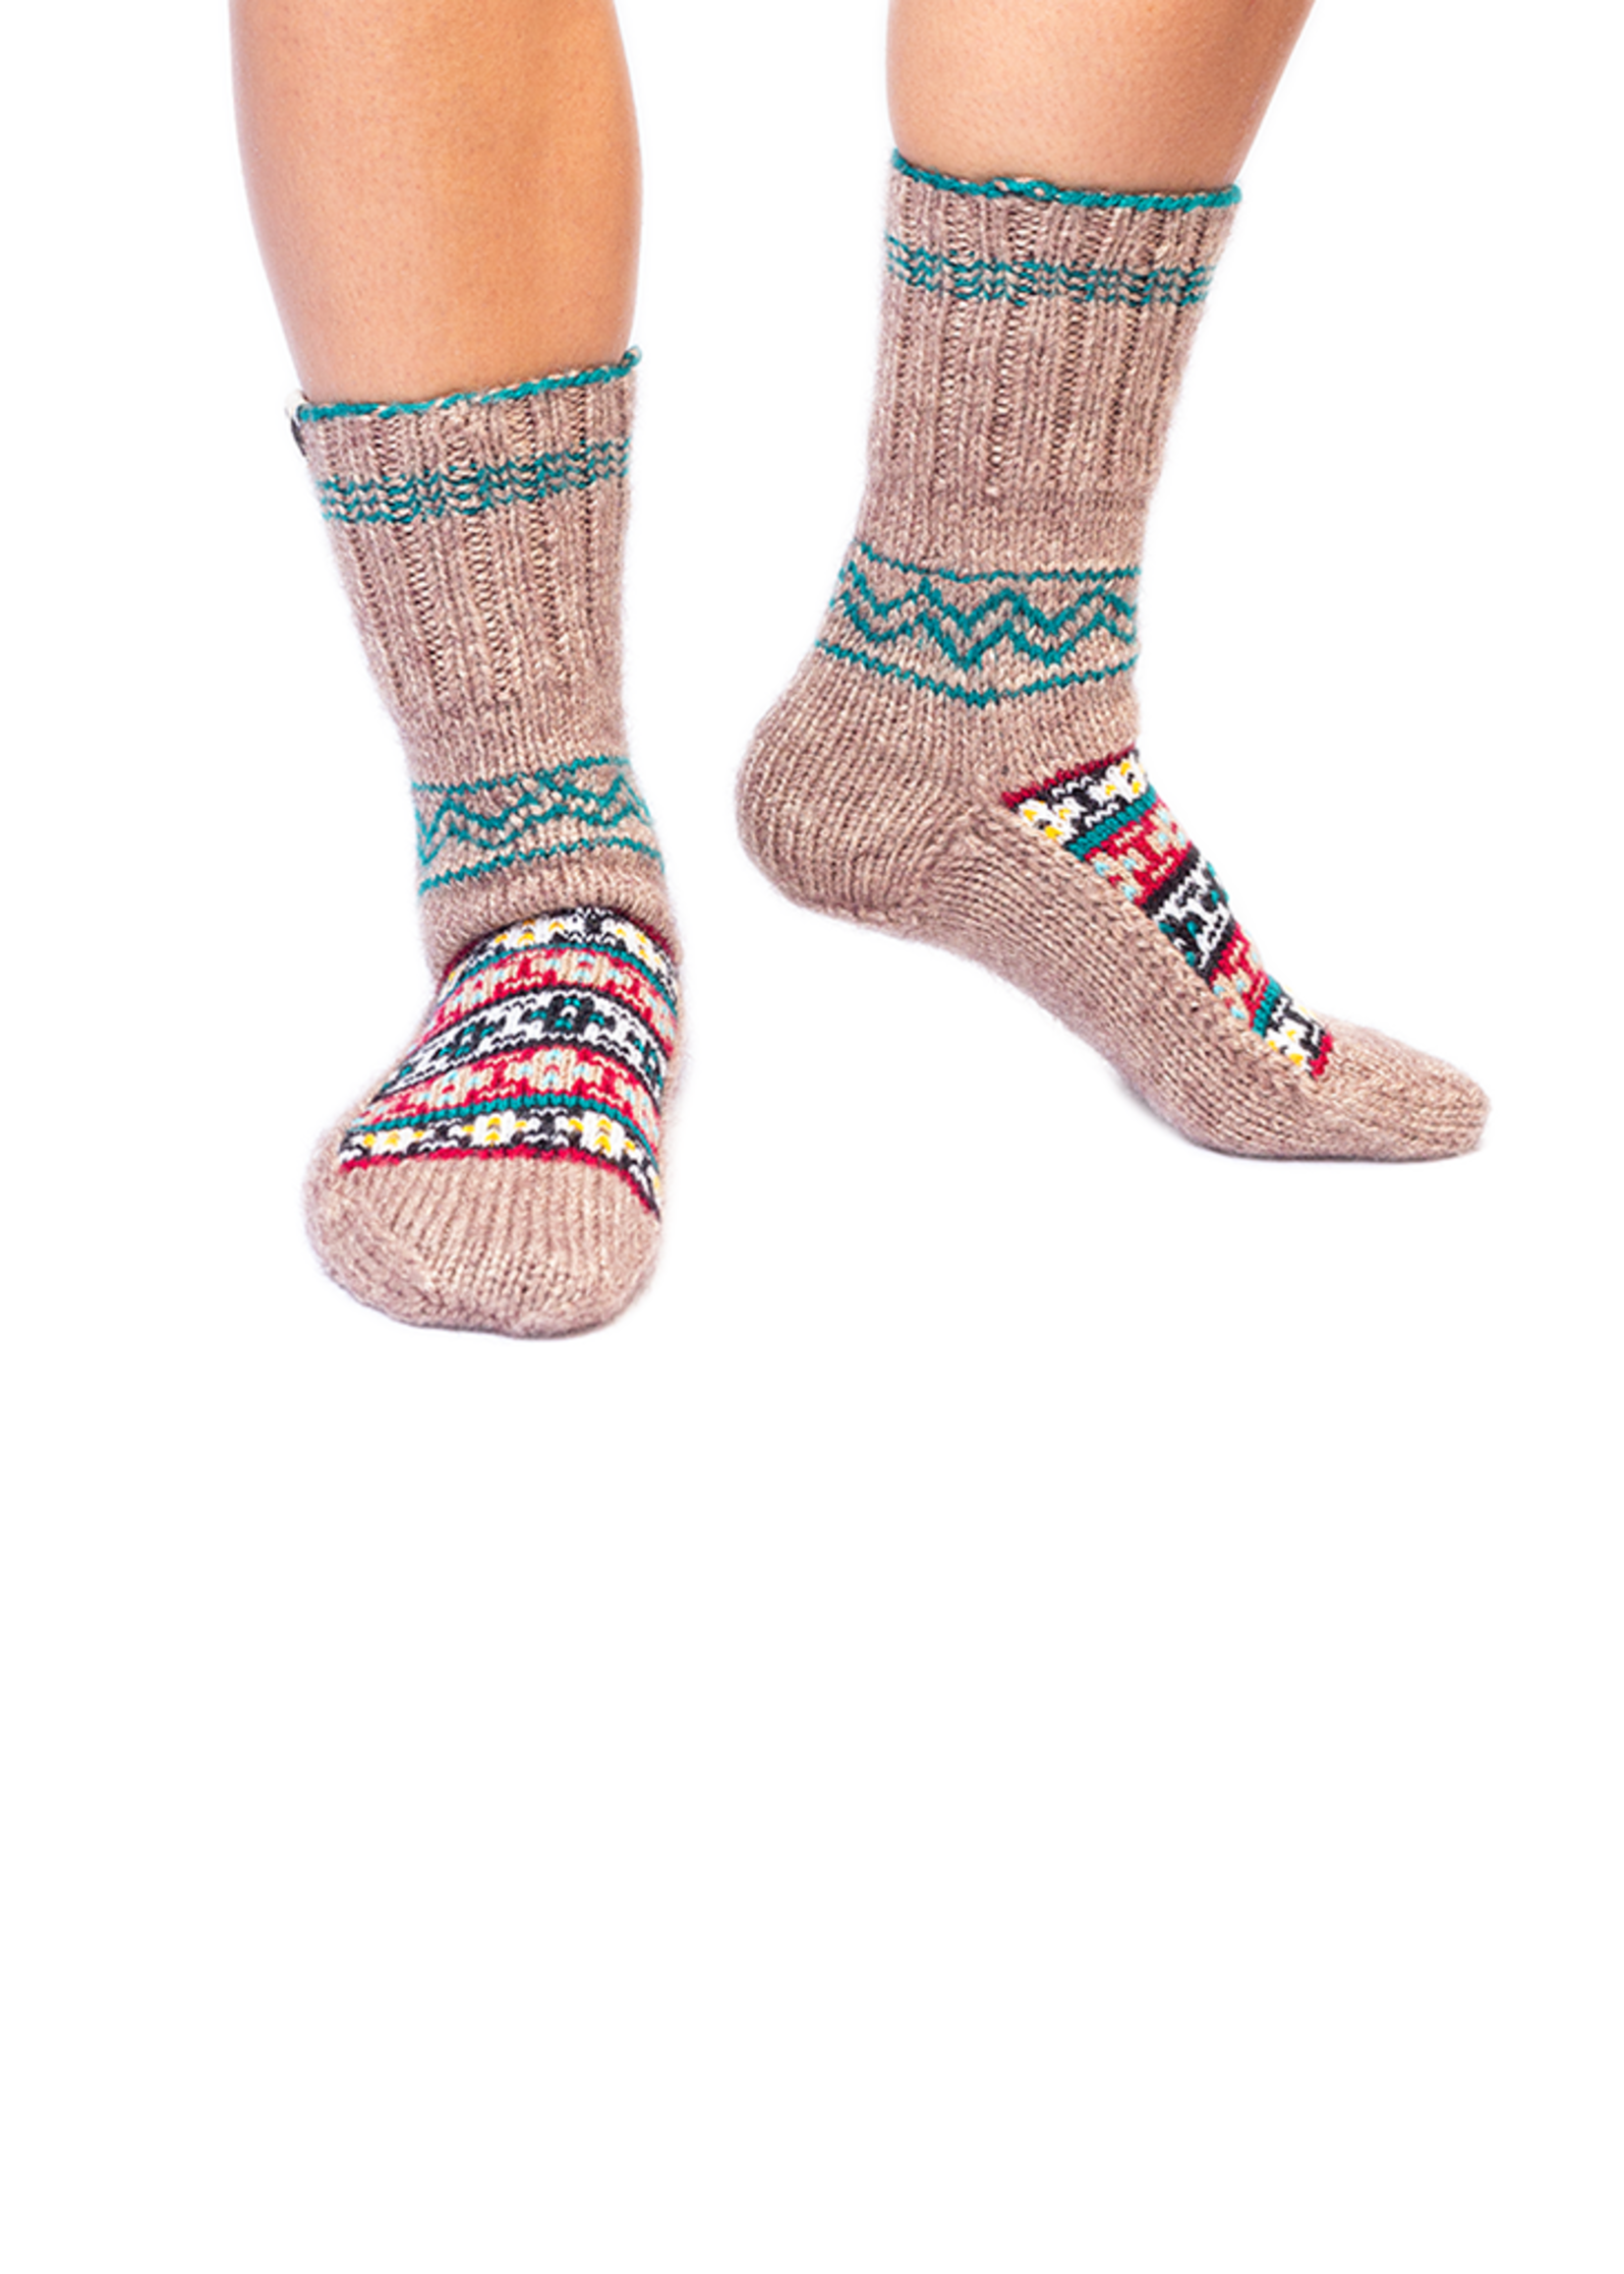 Hamesha (Always) Earth Socks